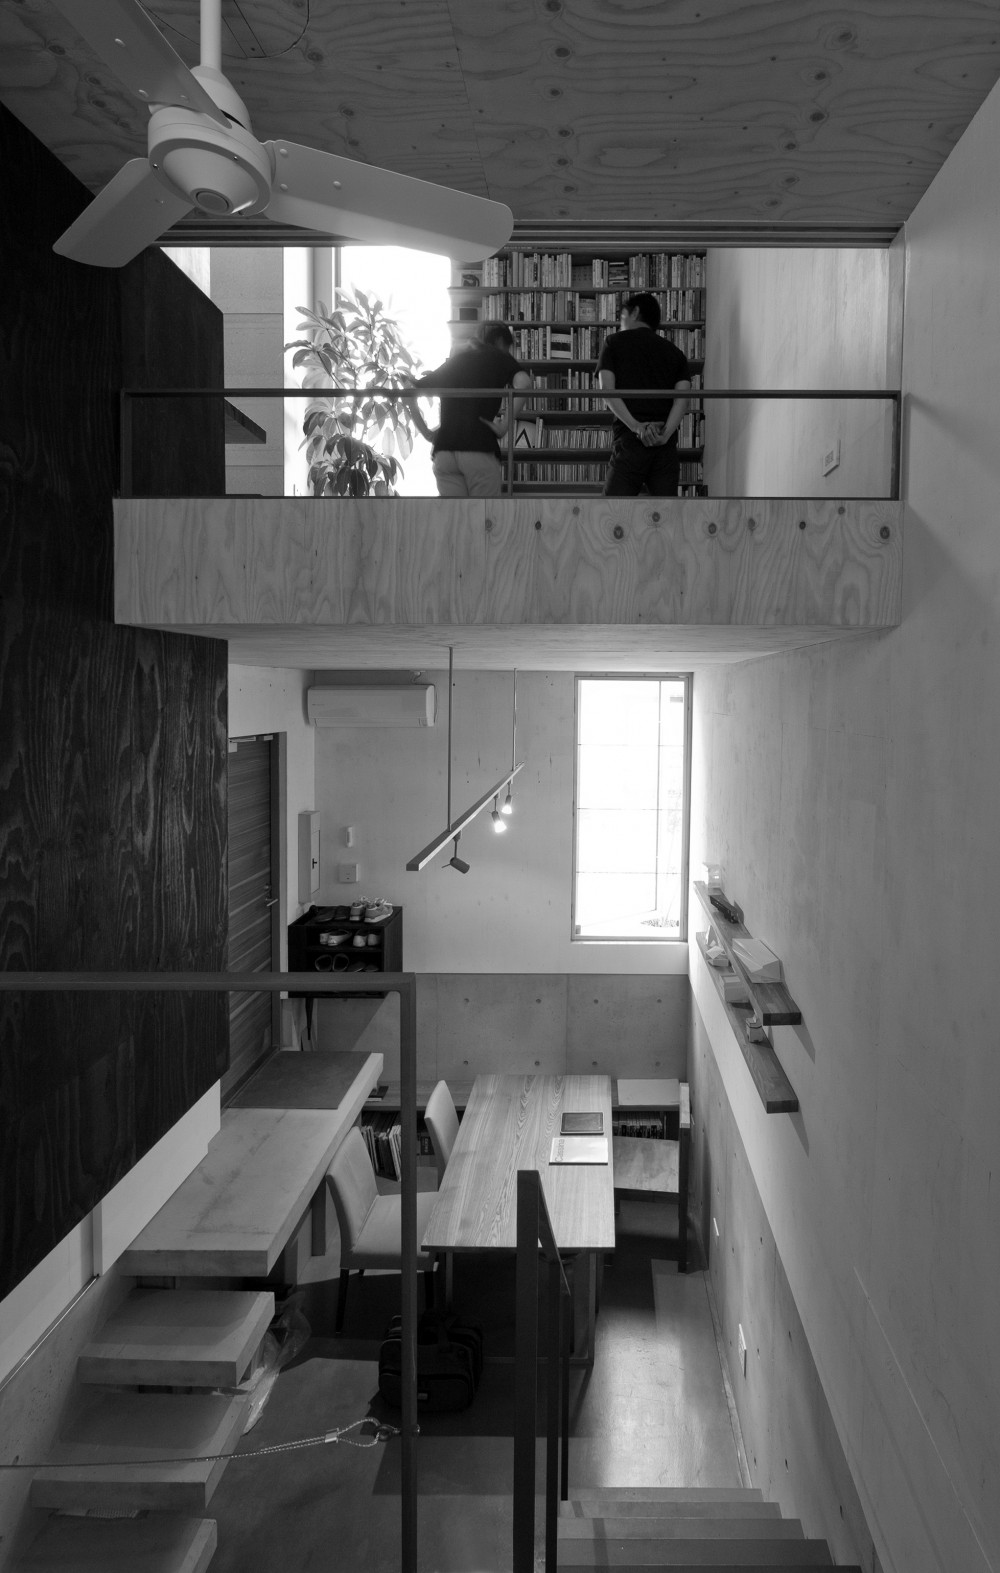 CmSoHo スキップフロアを用い、小さな土地に伸びやかな広がりのある空間を形成 (1階)